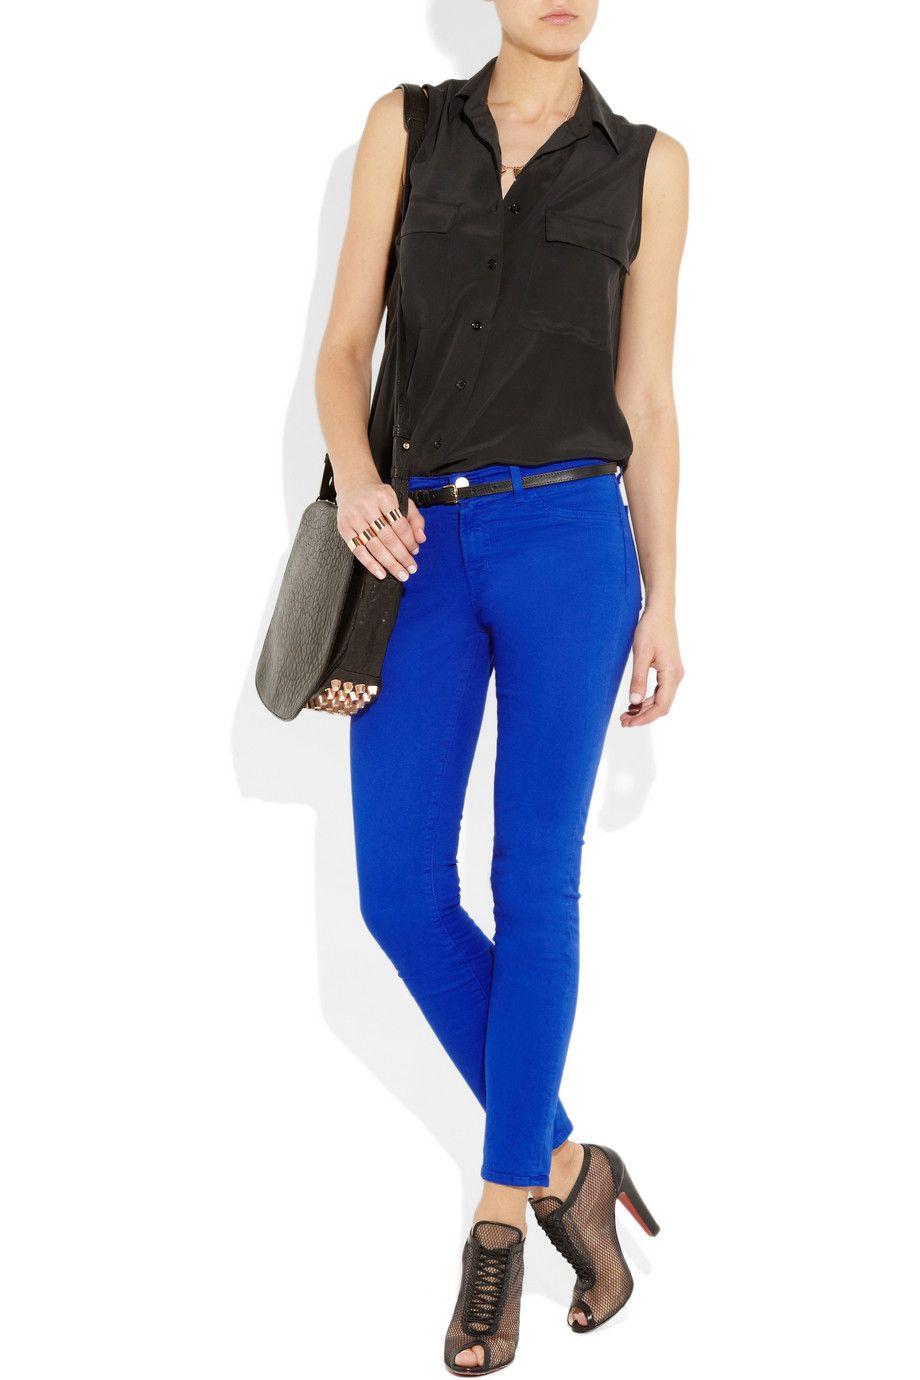 J Brand twill skinny jeans $175